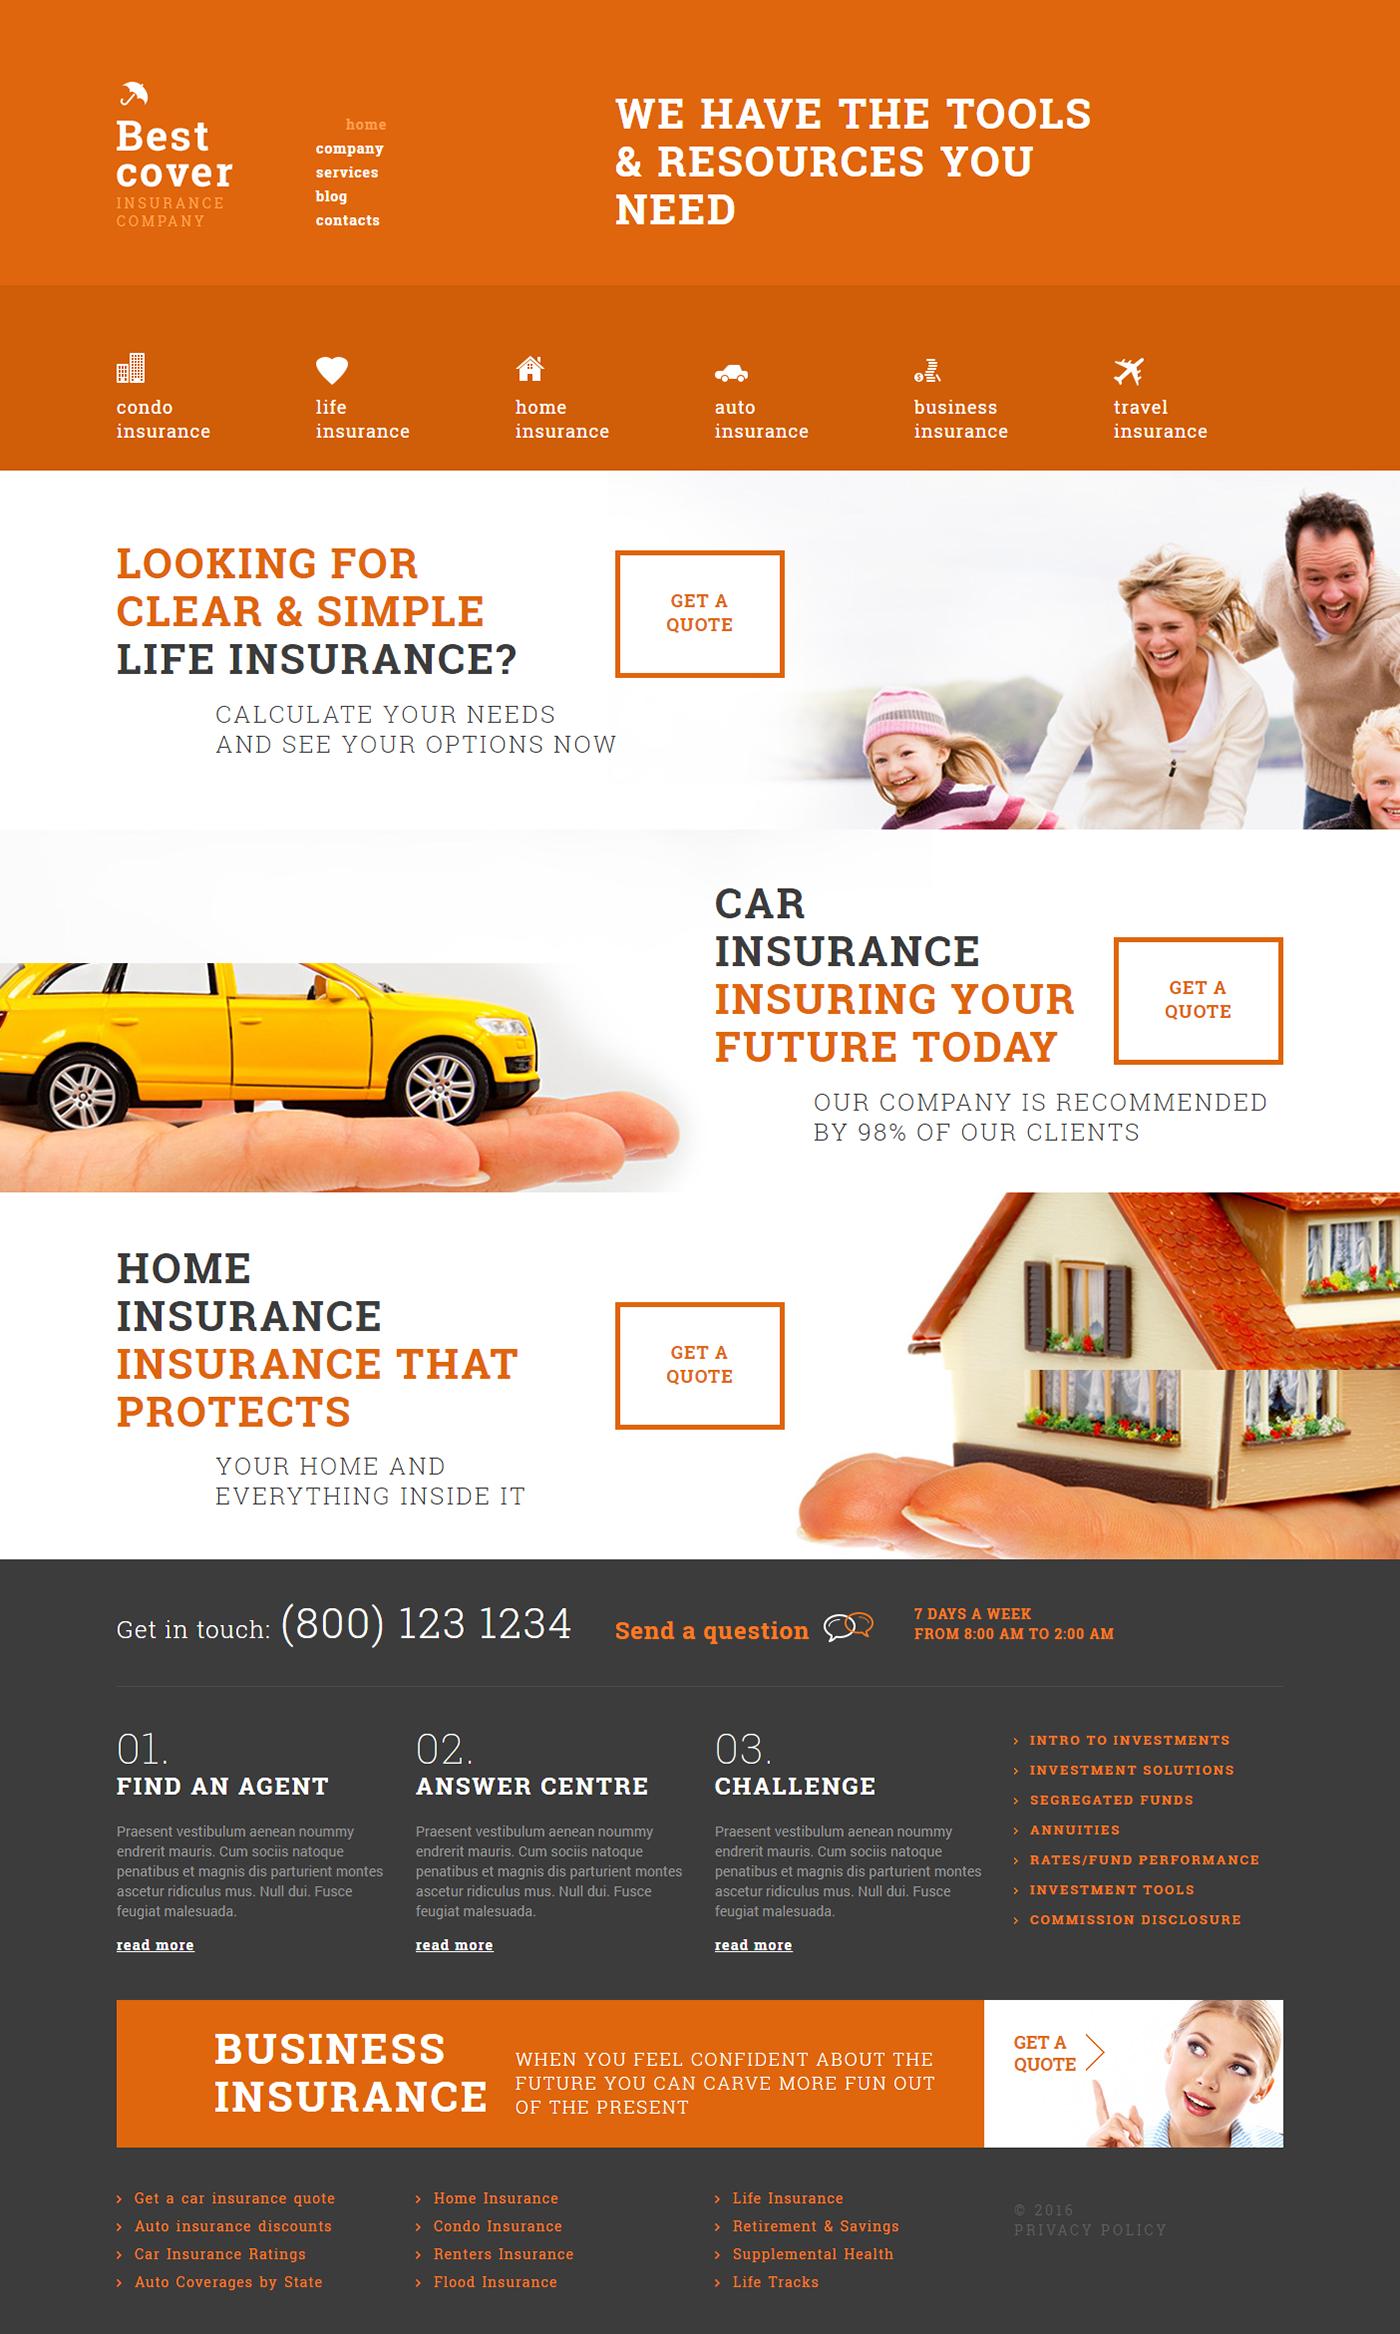 Insurance company wordpress theme on behance wordpress themes insurance company wordpress theme on behance business website wajeb Images